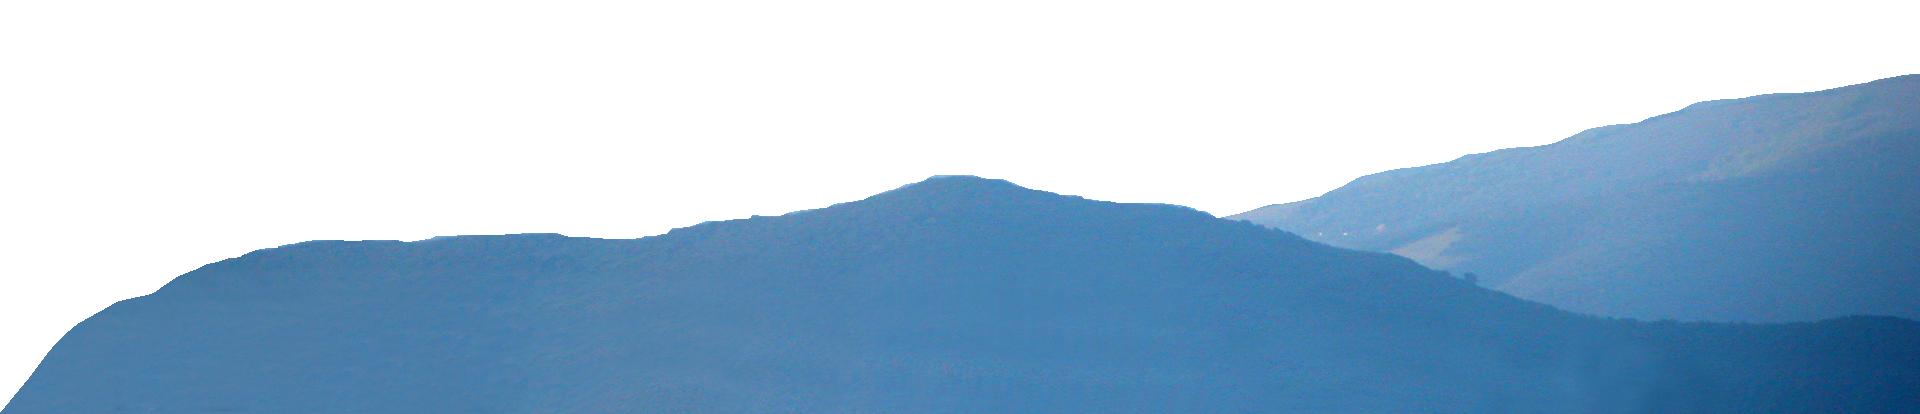 Montagne_2.png